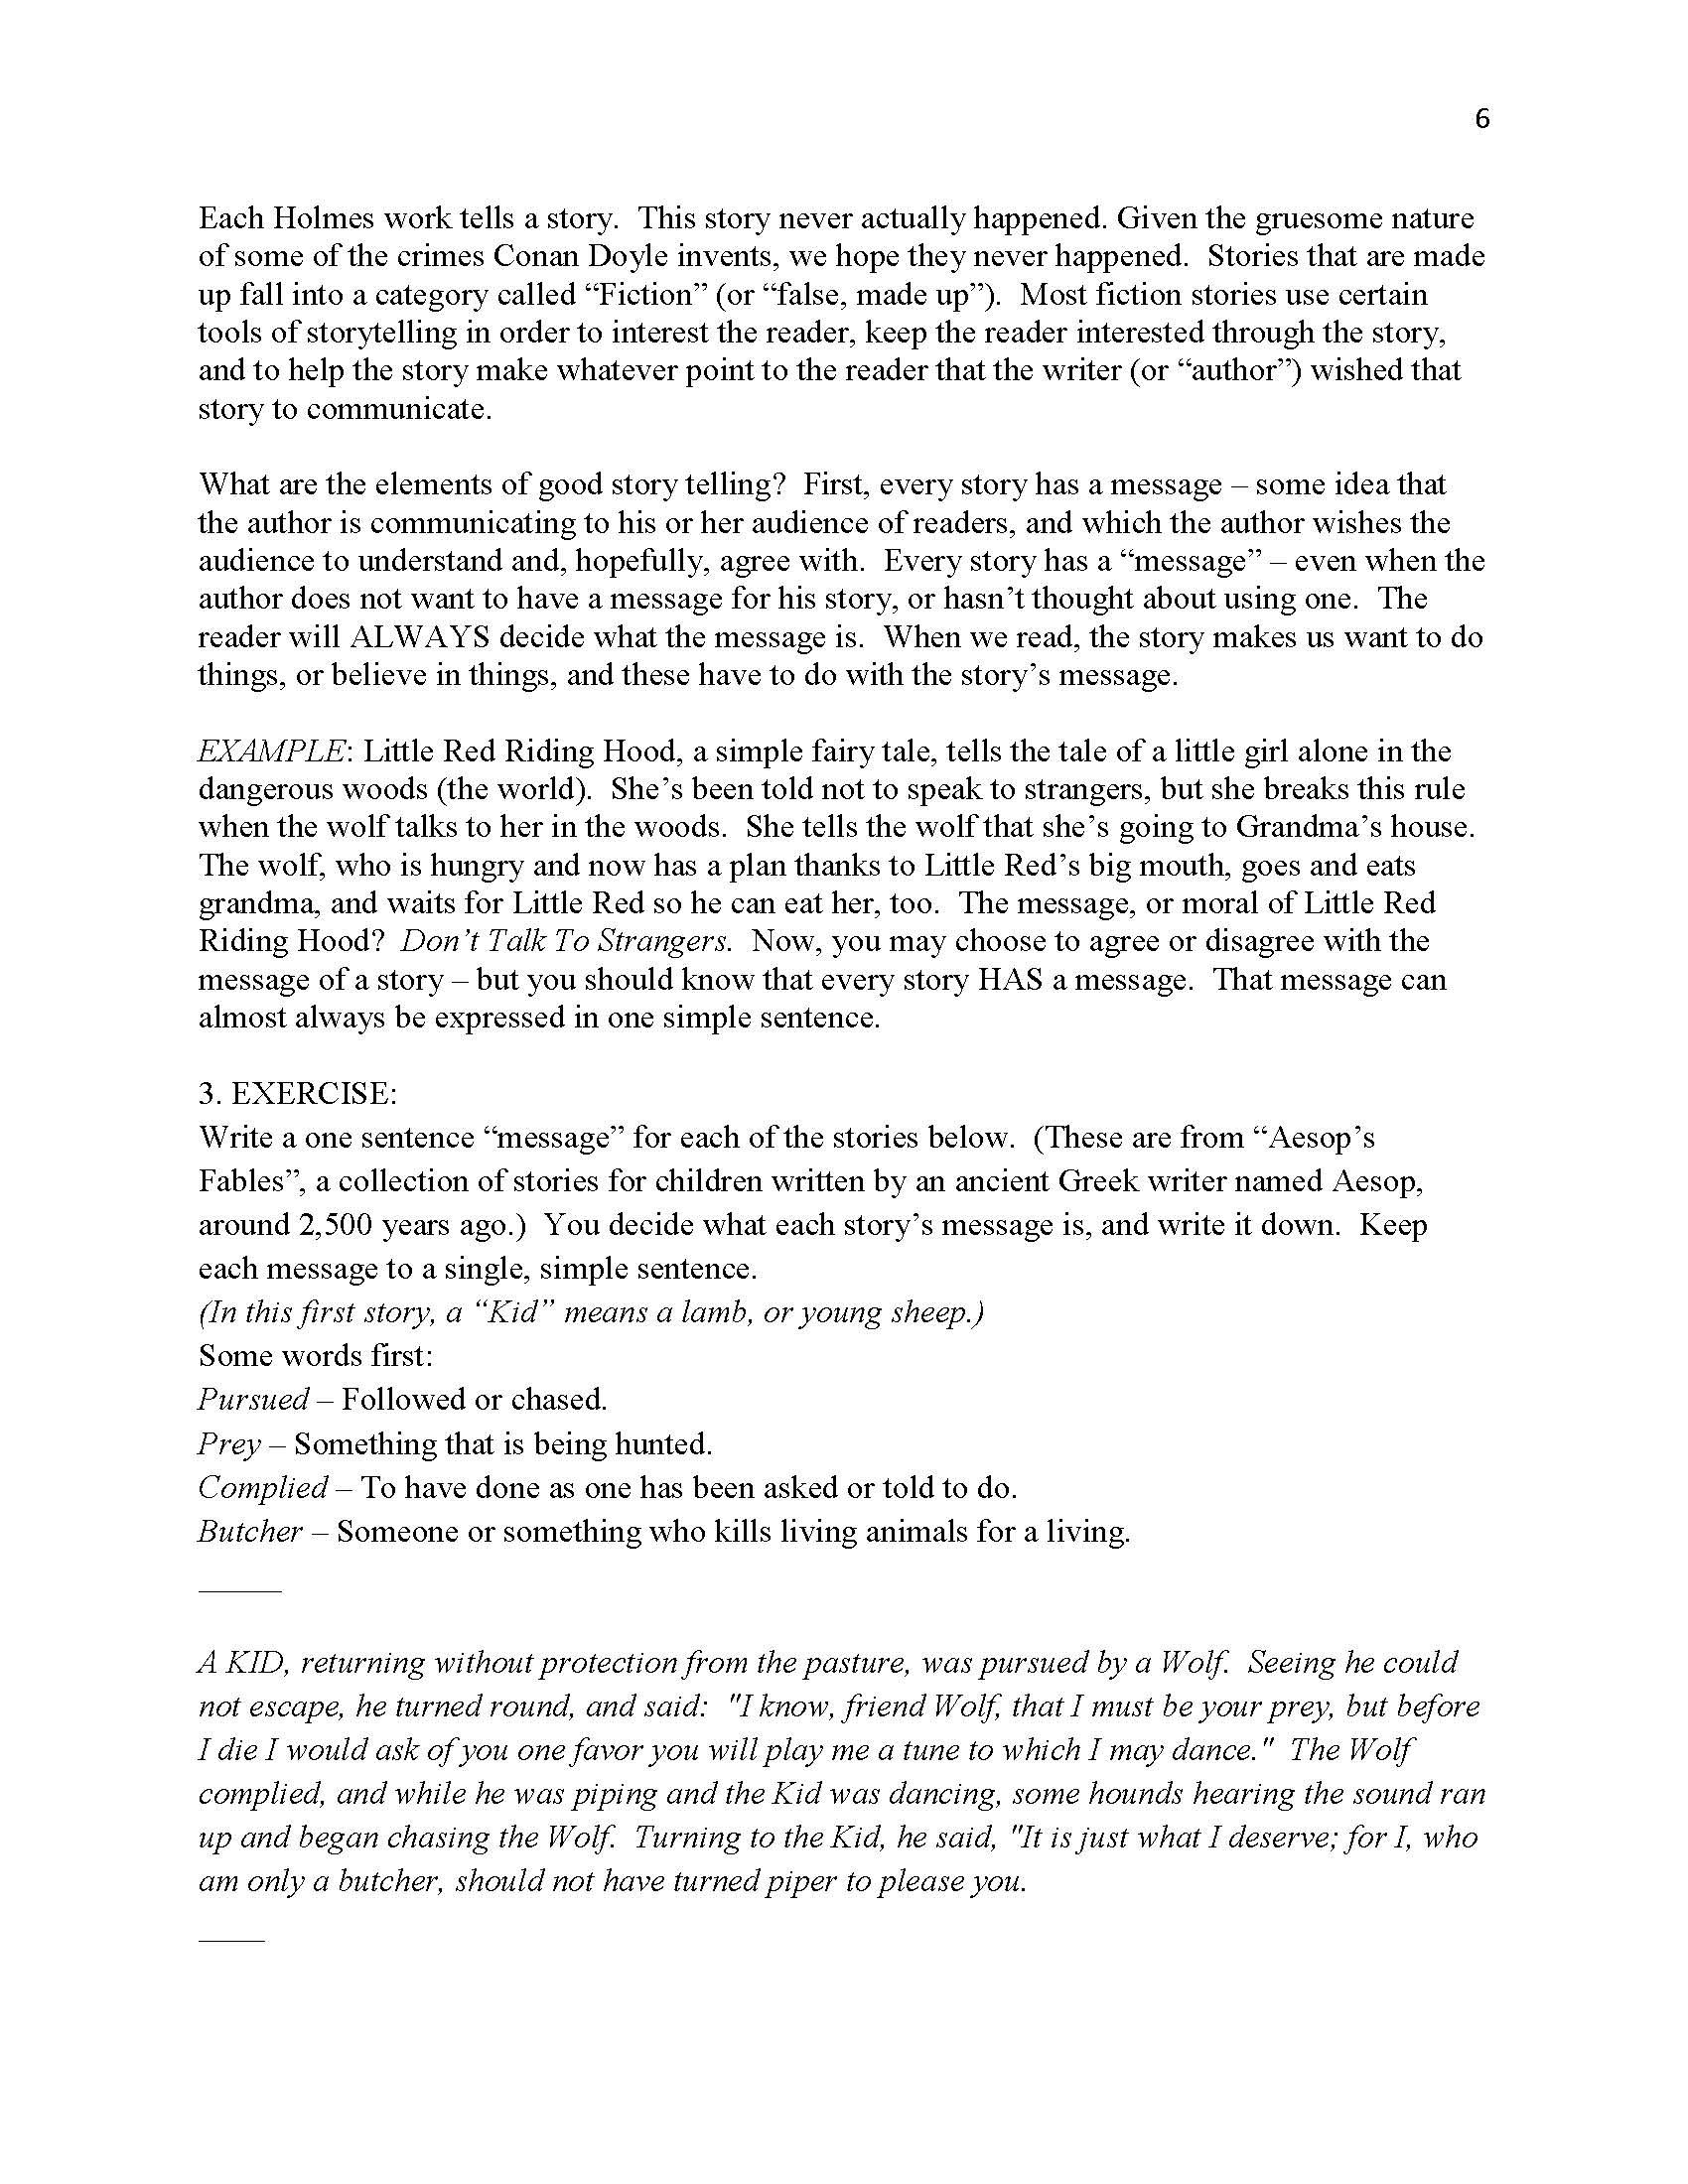 Step 3-4 Literature Guide - Sherlock Holmes Stories_Page_007.jpg